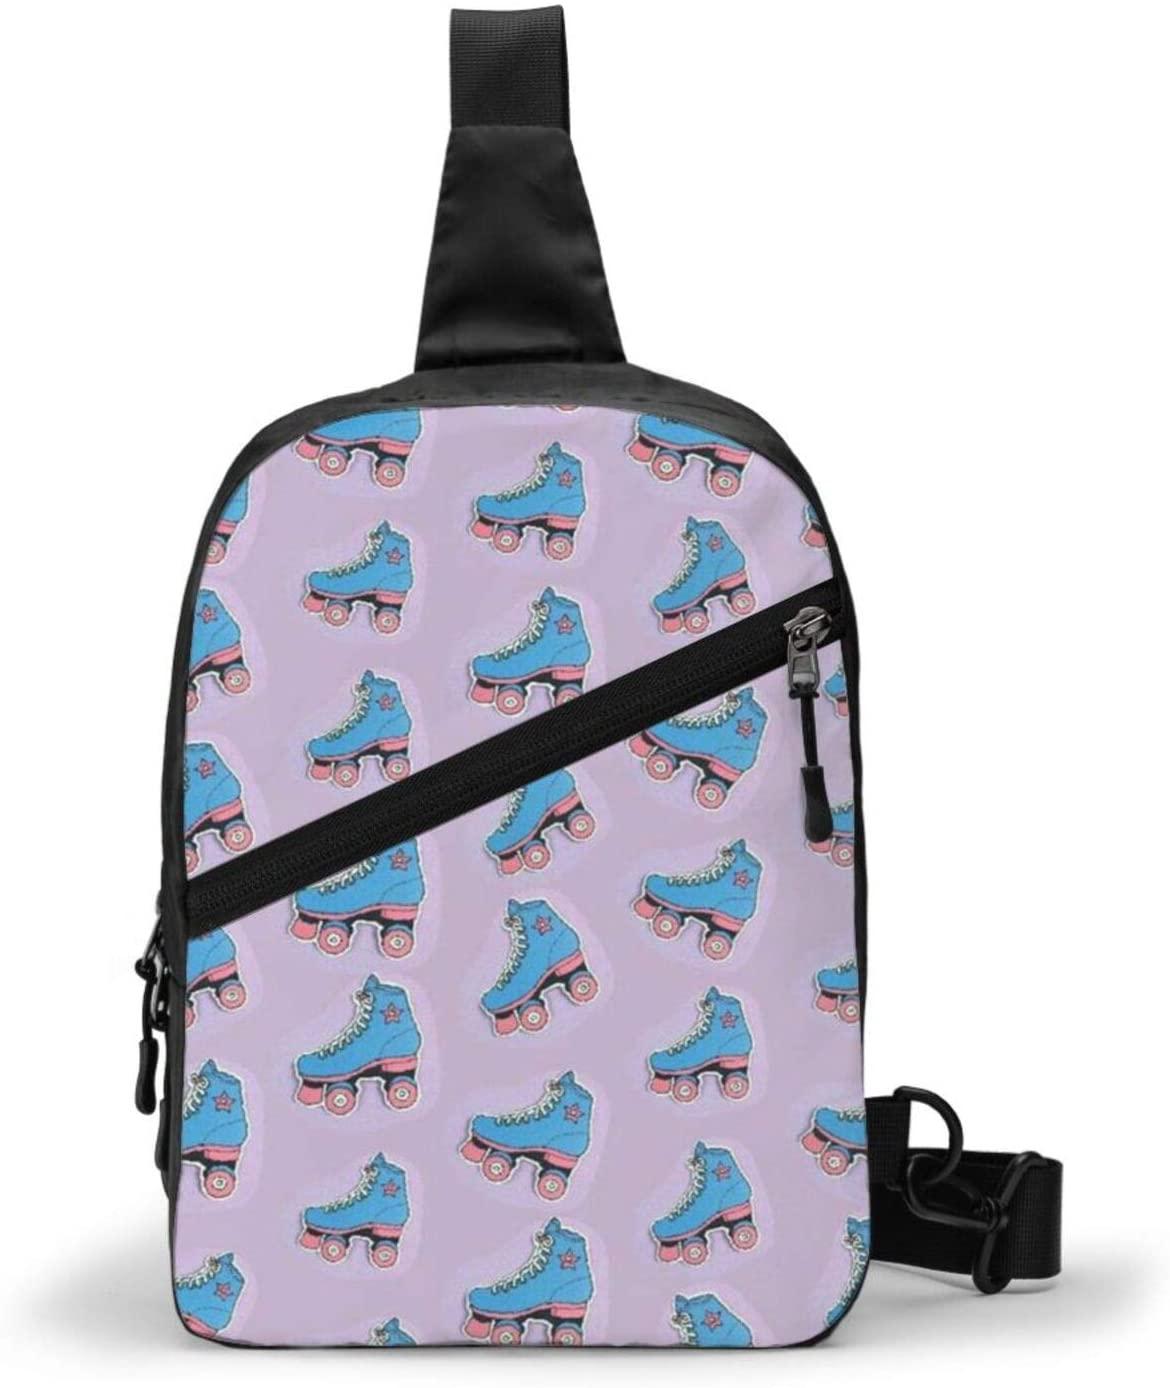 Neddelo Roller Skates Crossbody Bag,Portable Chest Bags,Folding Chest Bag, Men's and Women Sling Bag for Travel,Hiking, Cycling,Camping